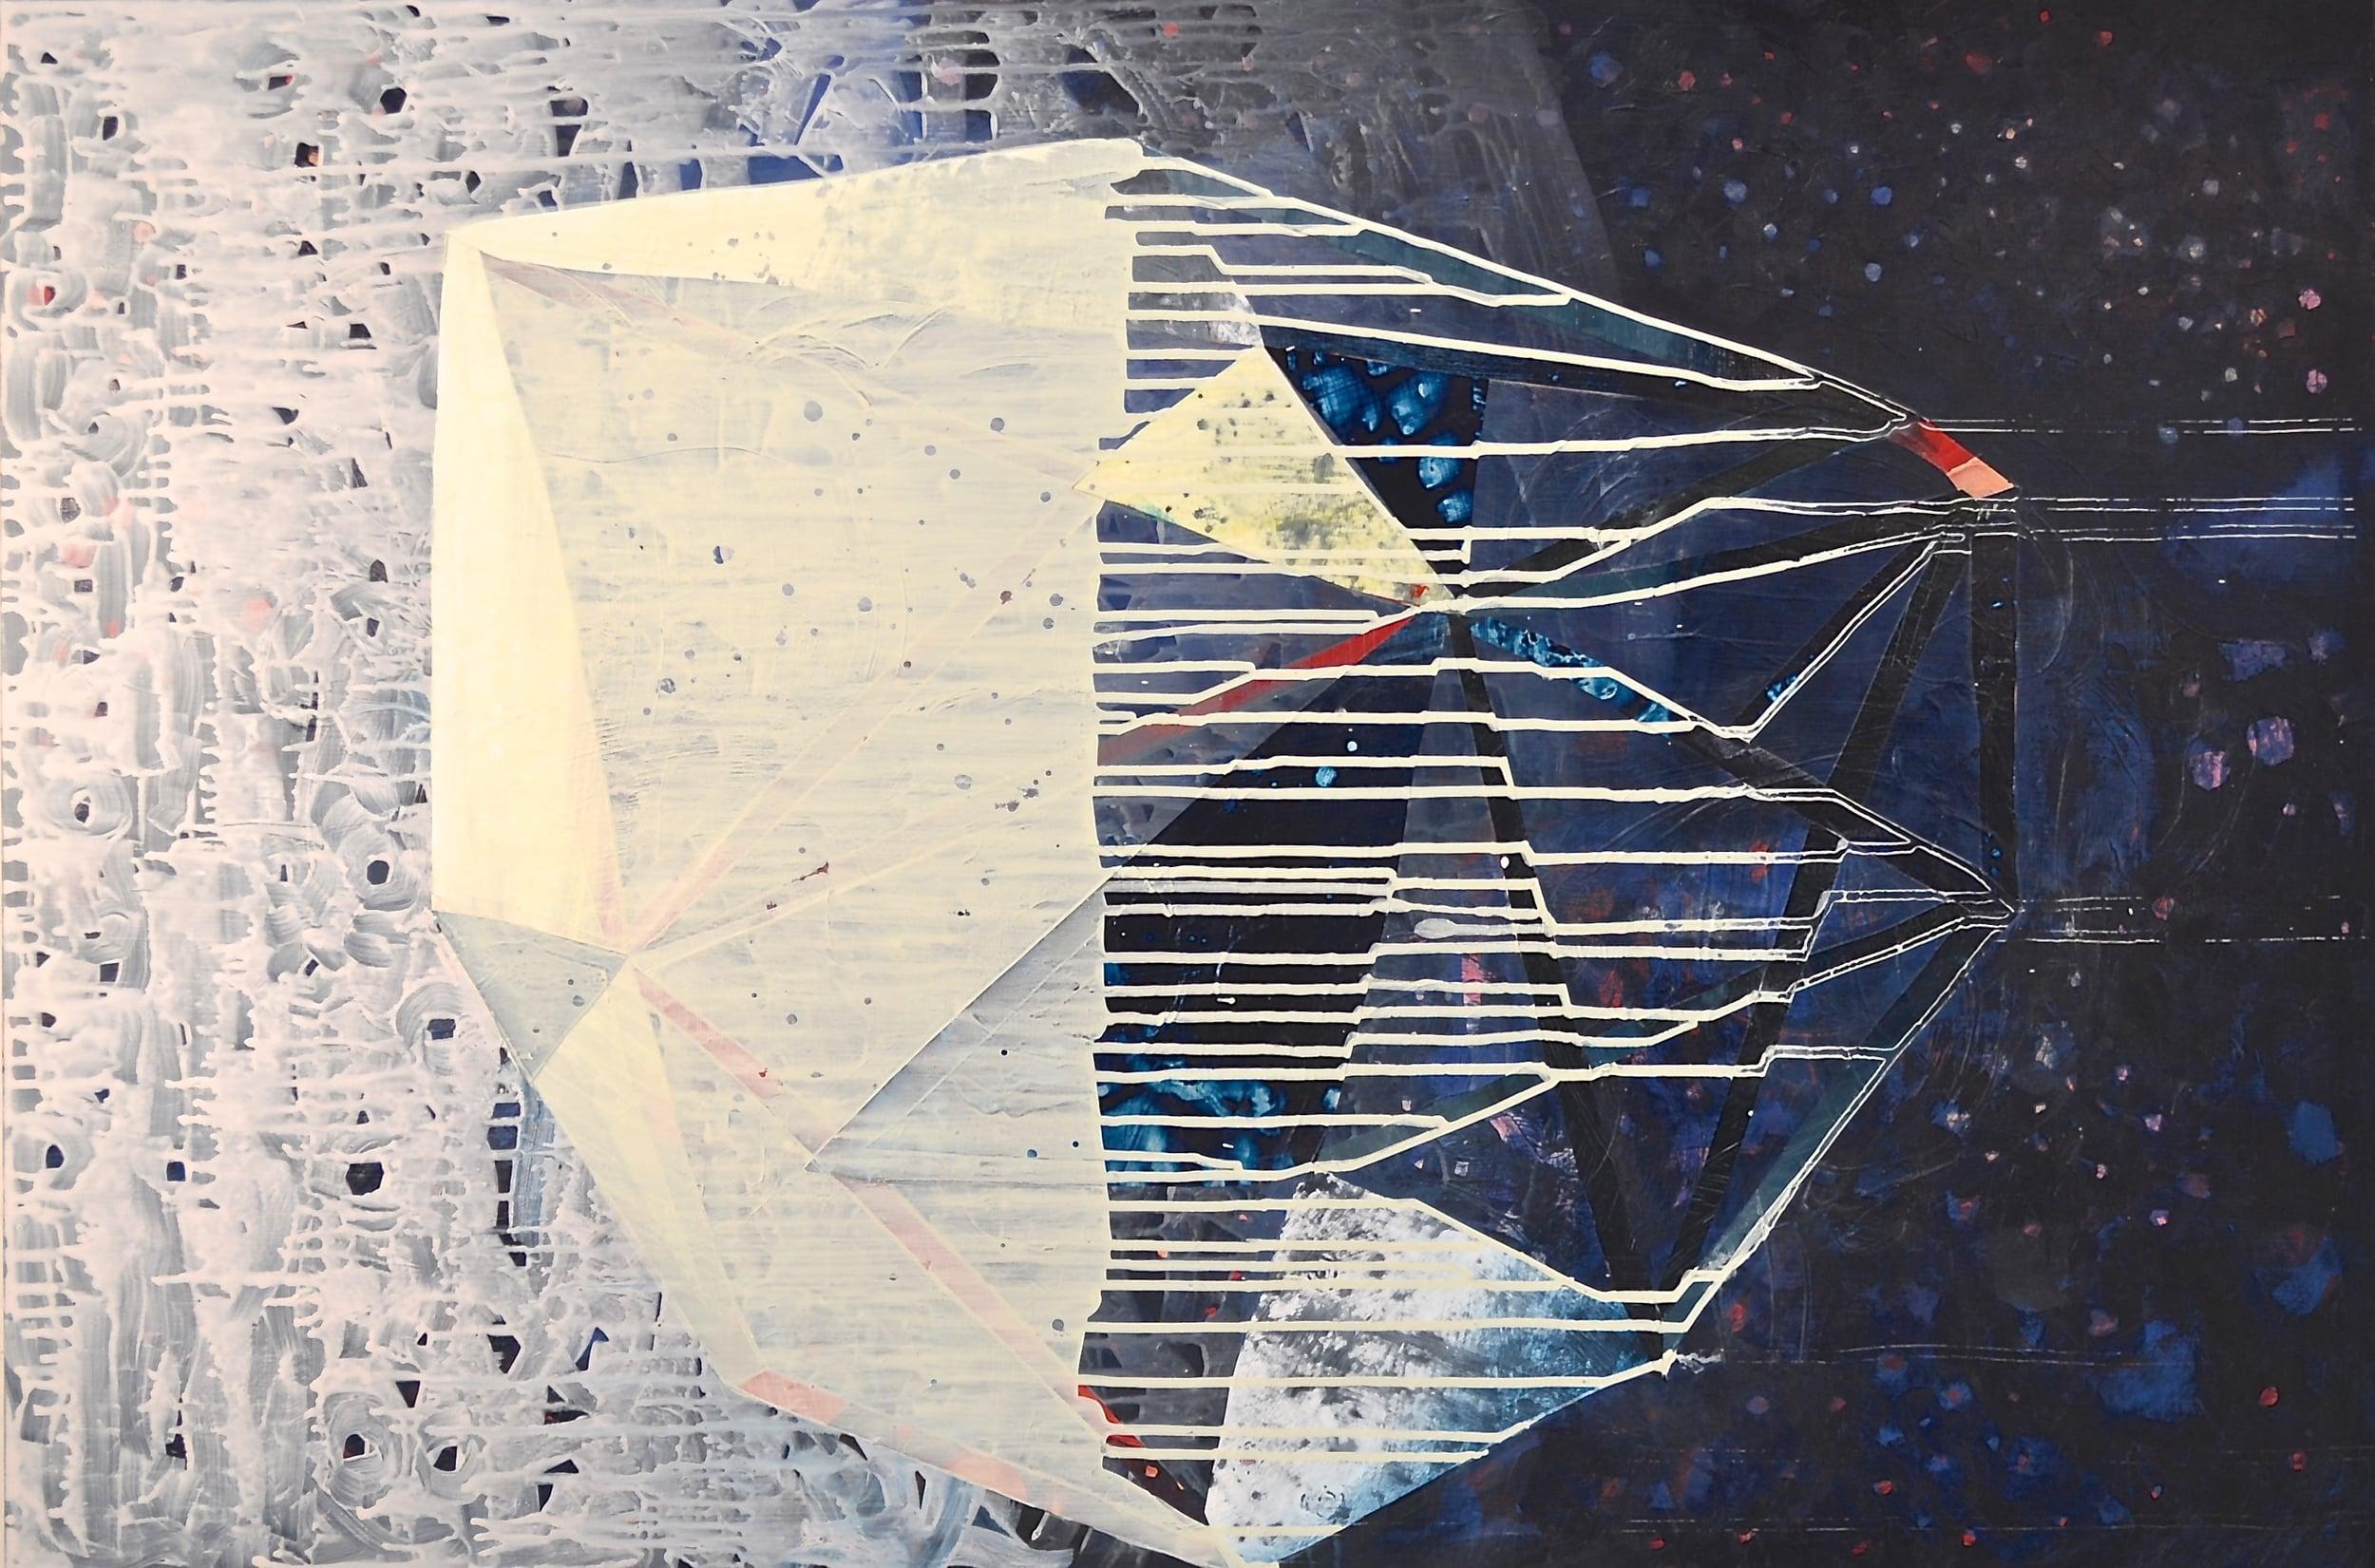 threshold, acrylic on birch panel, 42 x 28 inches, 2015